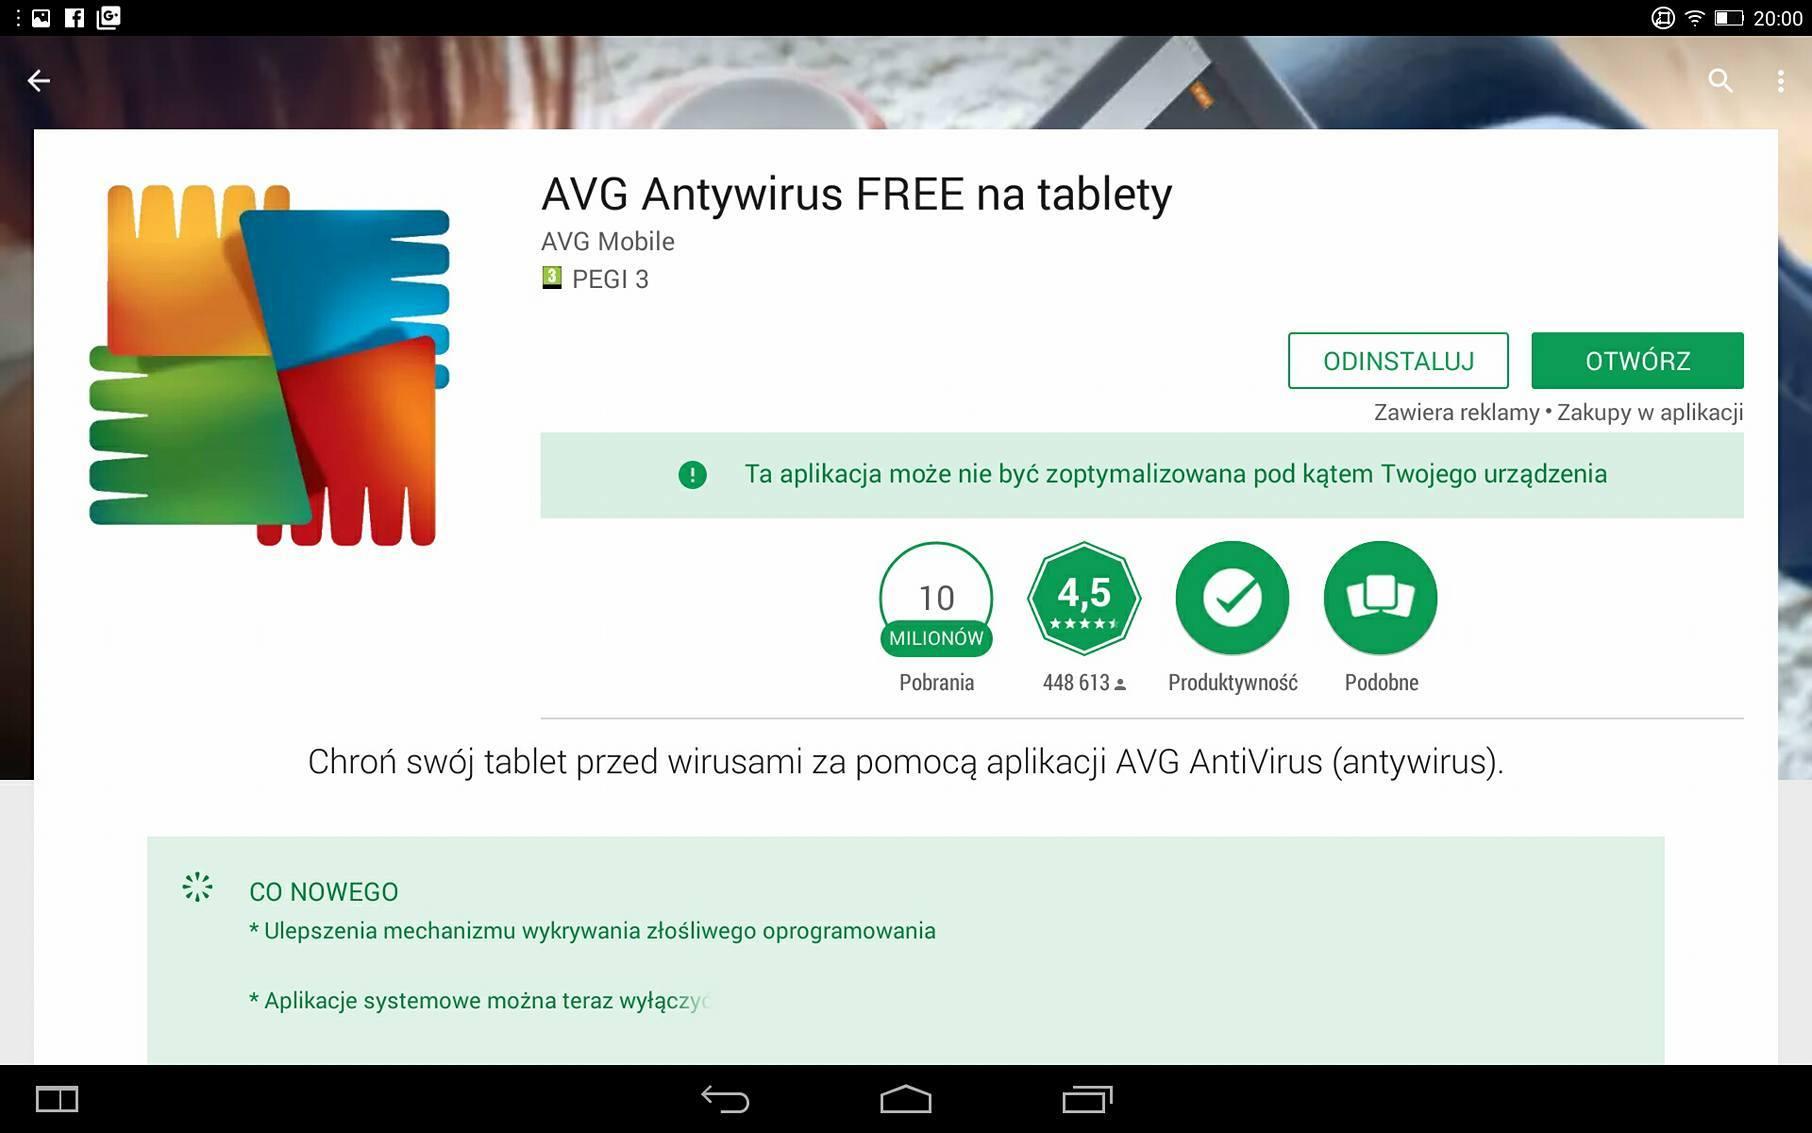 Strona sklepowa AVG Free